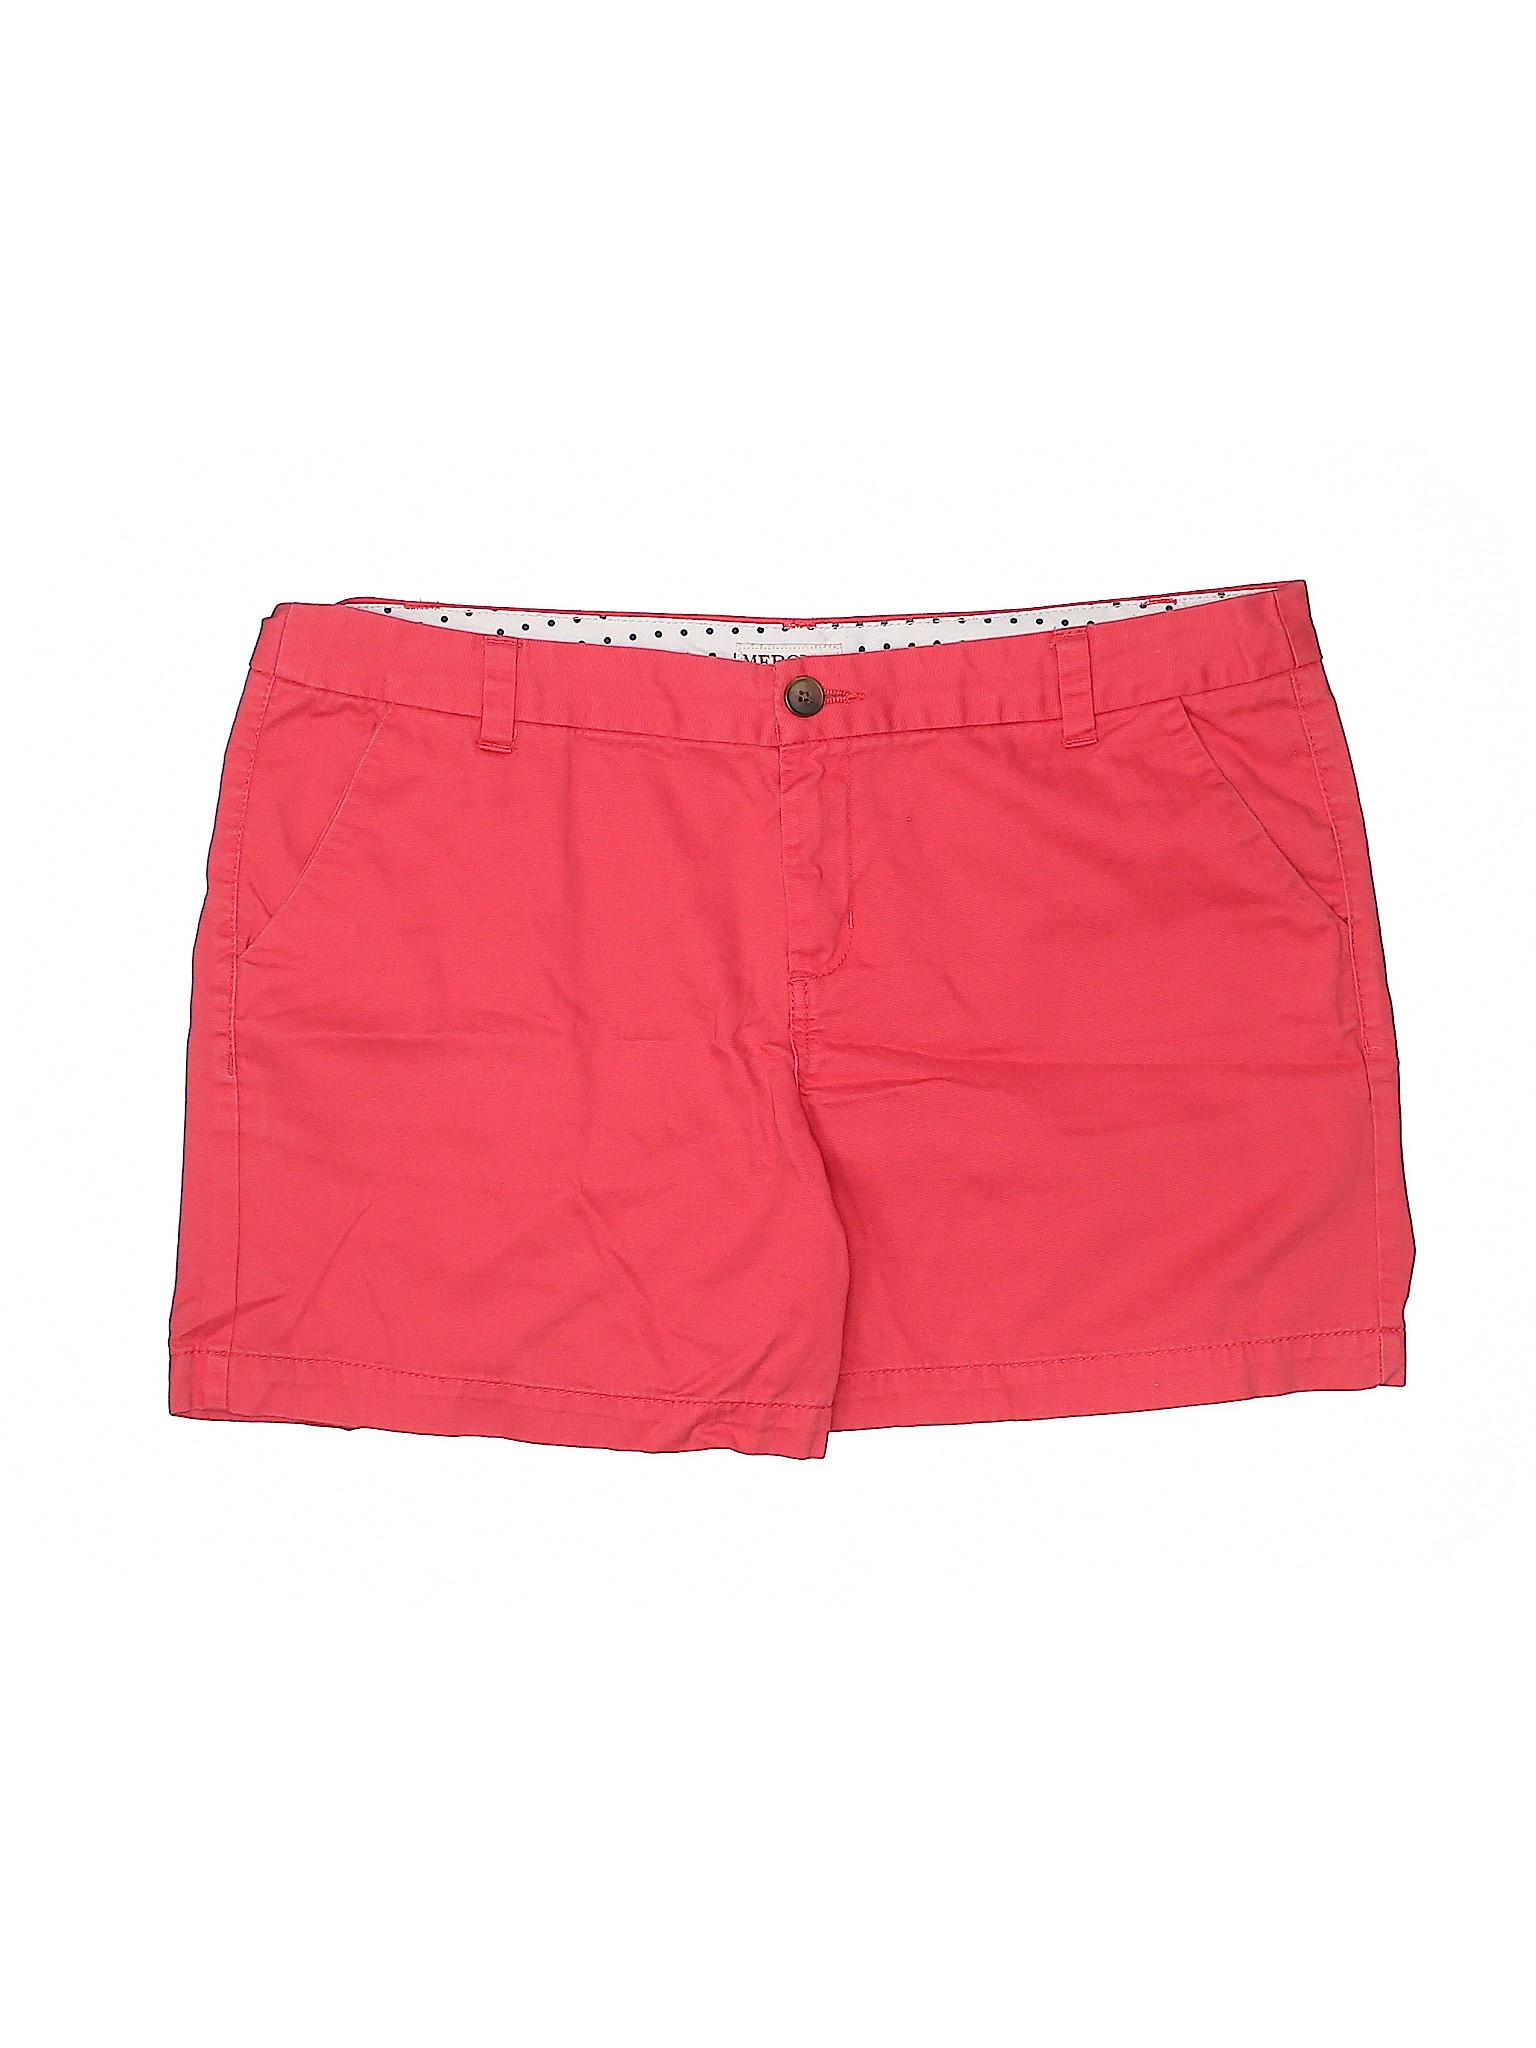 Boutique Boutique Merona Shorts Merona Merona Boutique Shorts Shorts Merona Boutique xFtHt6B